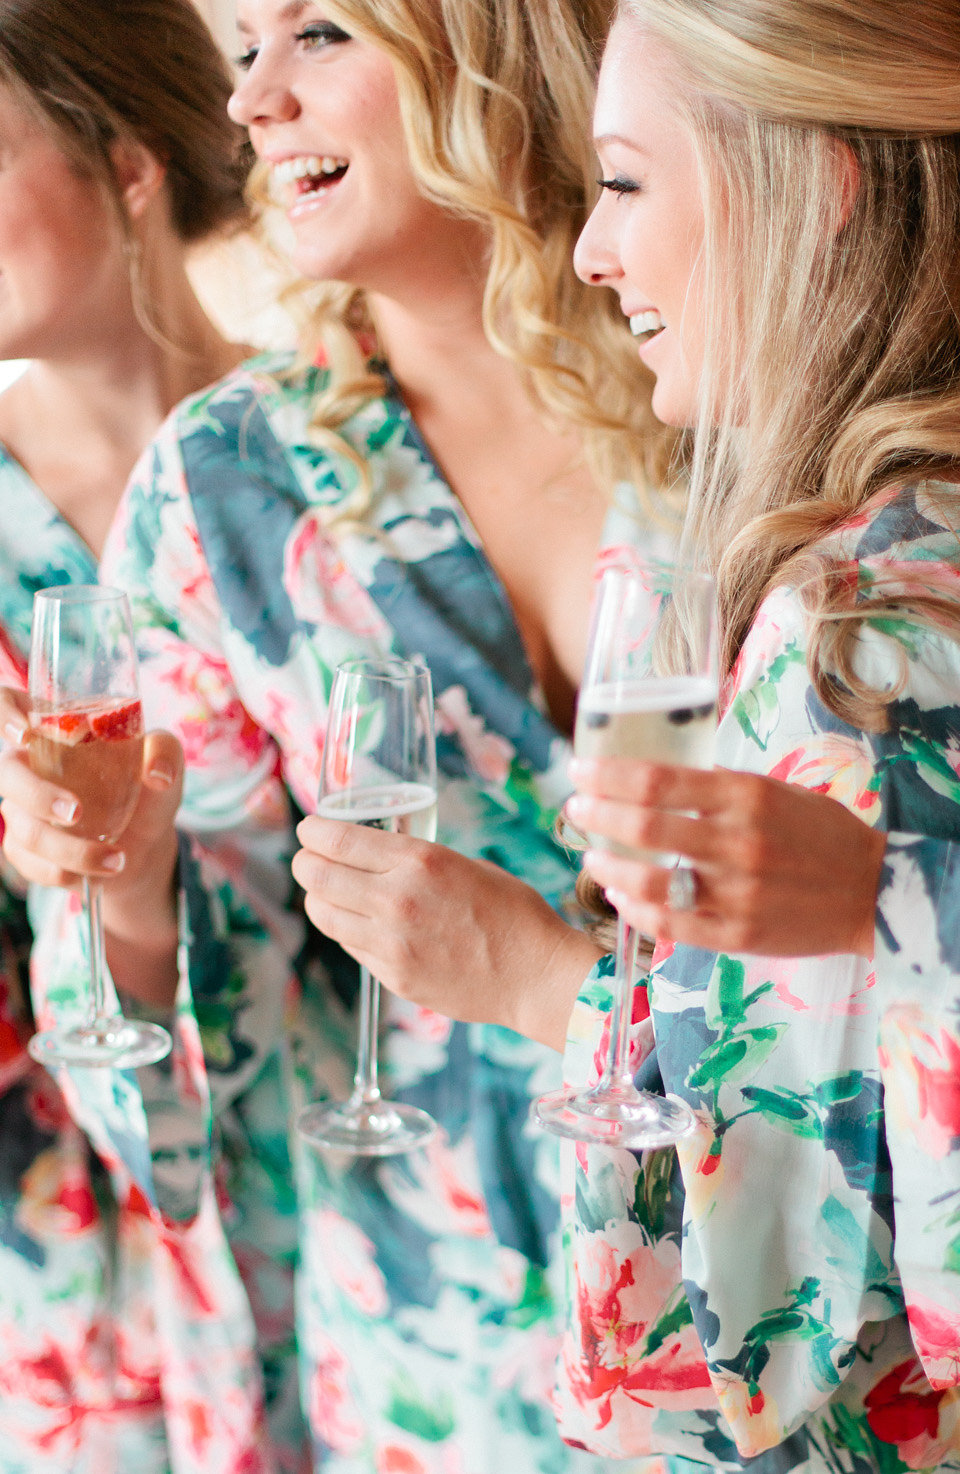 Floral Bridesmaids Robes   Blush Wedding at TPC Sawgrass Wedding Ponte Vedra Beach  Jacksonville Wedding Planner Blue Ribbon Weddings  Jacksonville Wedding Photographer Debra Eby Photography  Wedding Ceremony & Reception at TPC Sawgrass Jacksonville